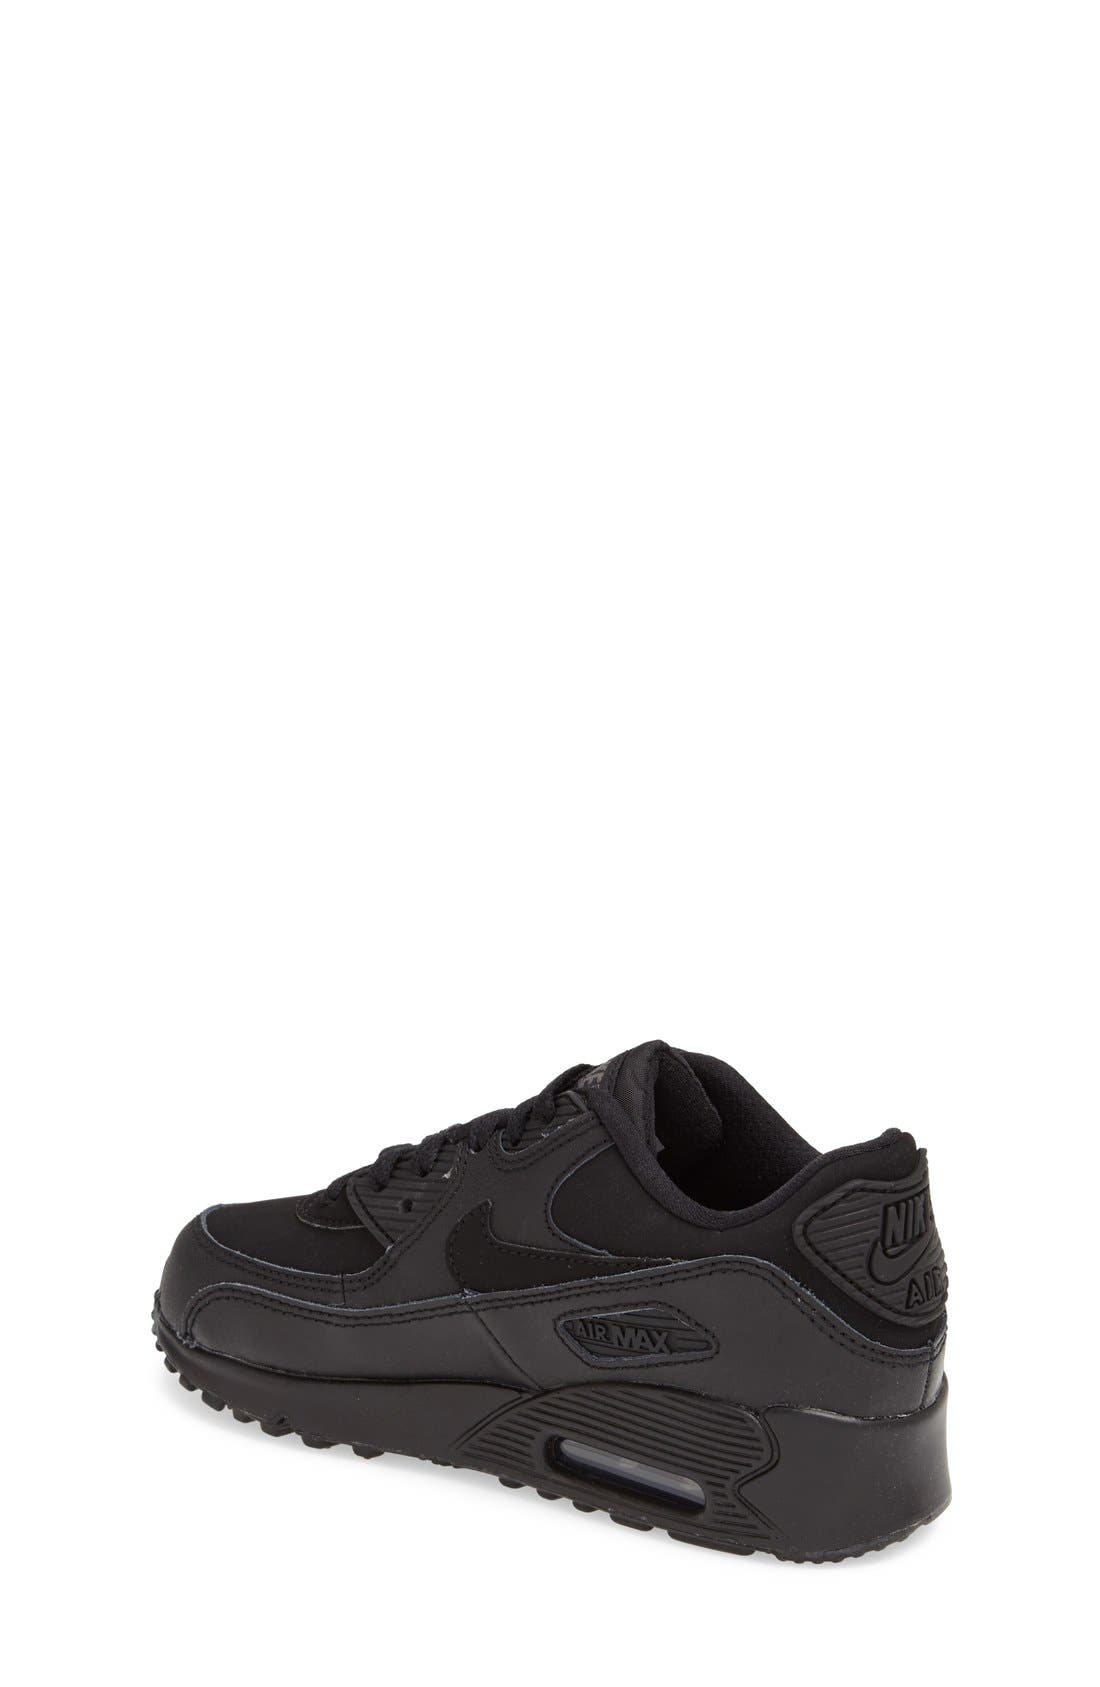 Alternate Image 2  - Nike 'Air Max Classic' Running Shoe (Baby, Walker, Toddler, Little Kid & Big Kid)